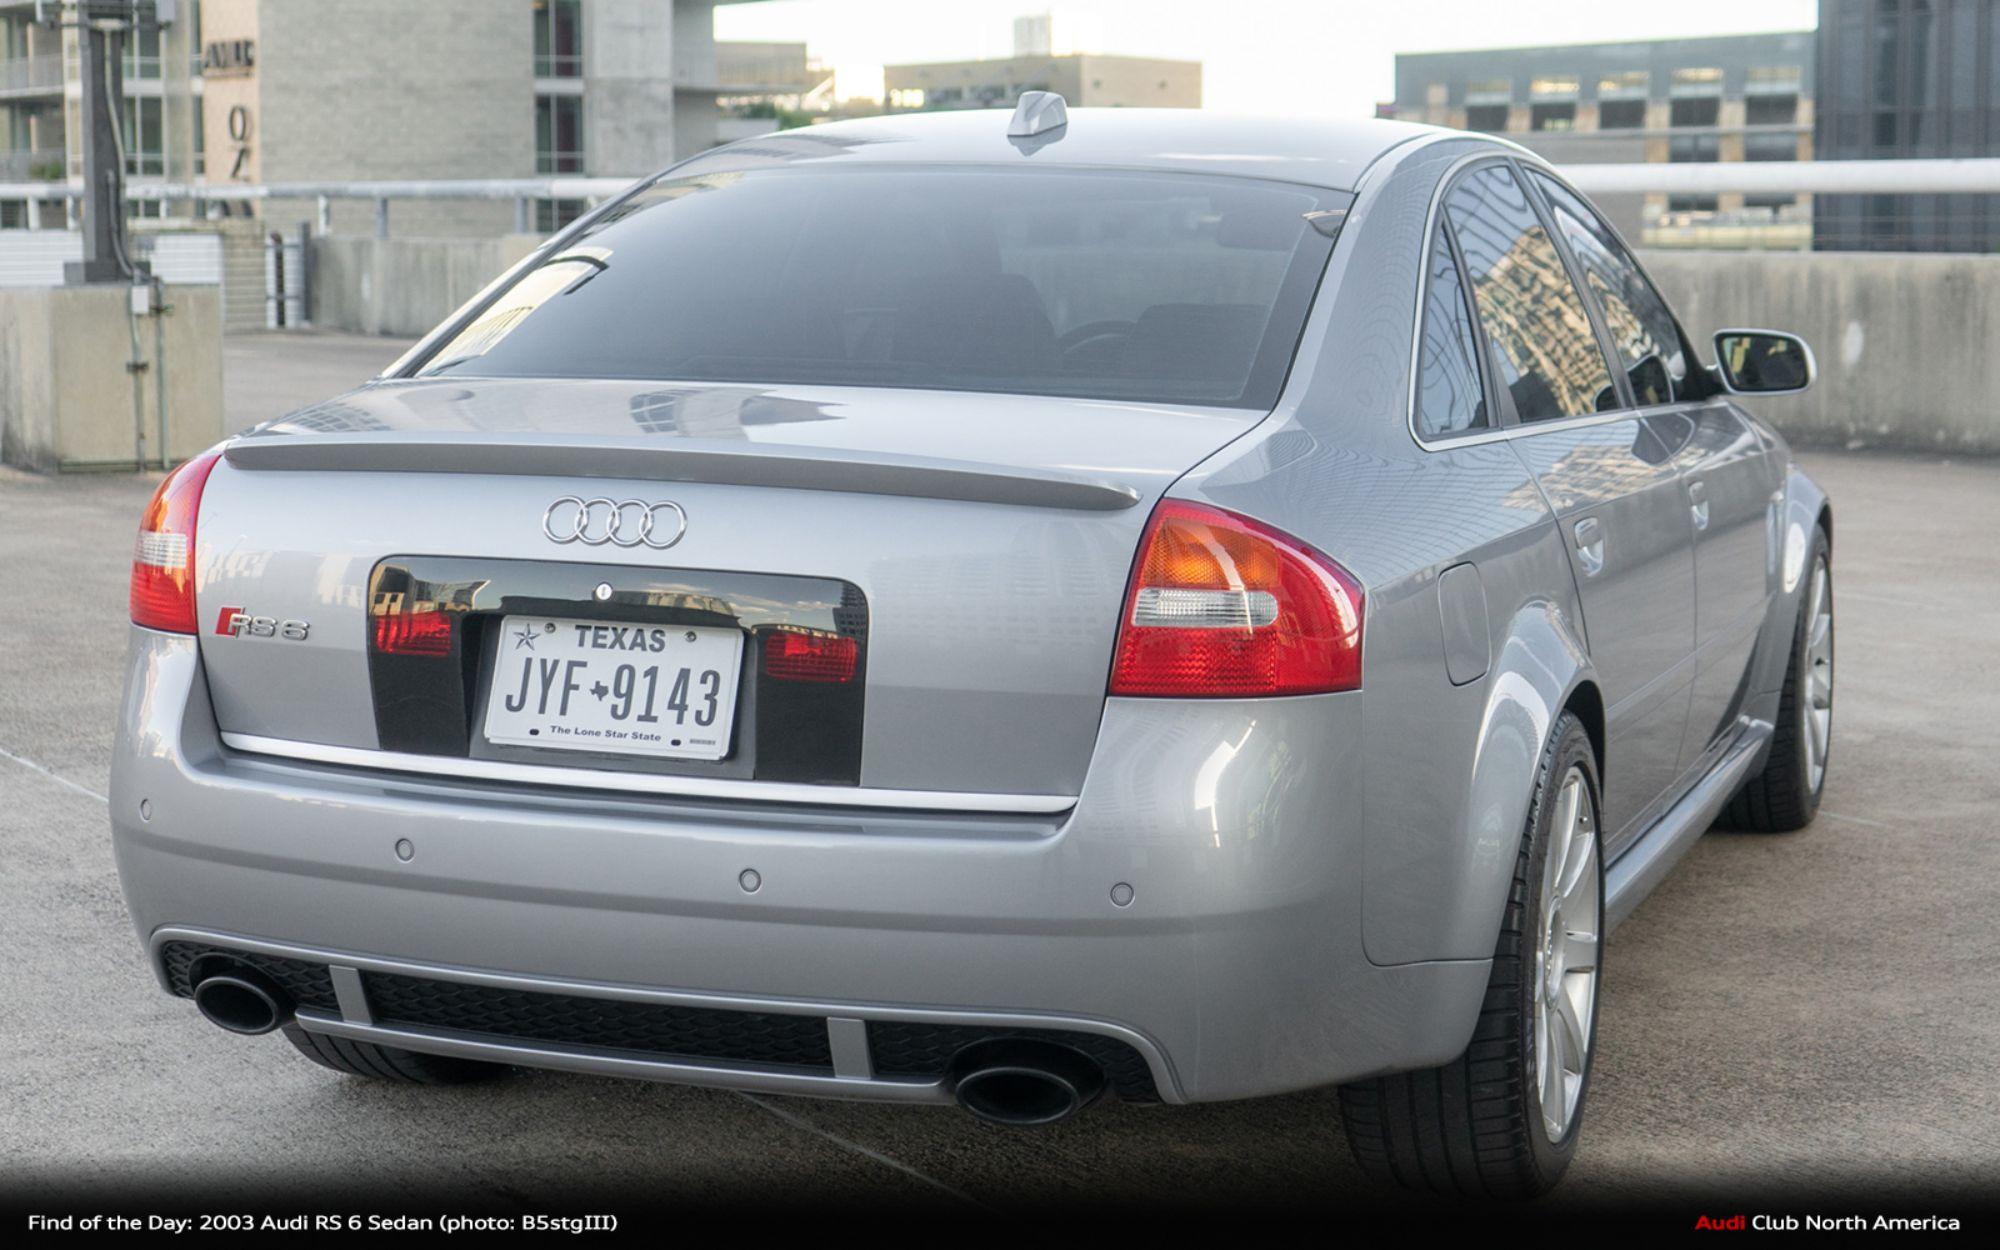 Kekurangan Audi Rs6 2003 Perbandingan Harga